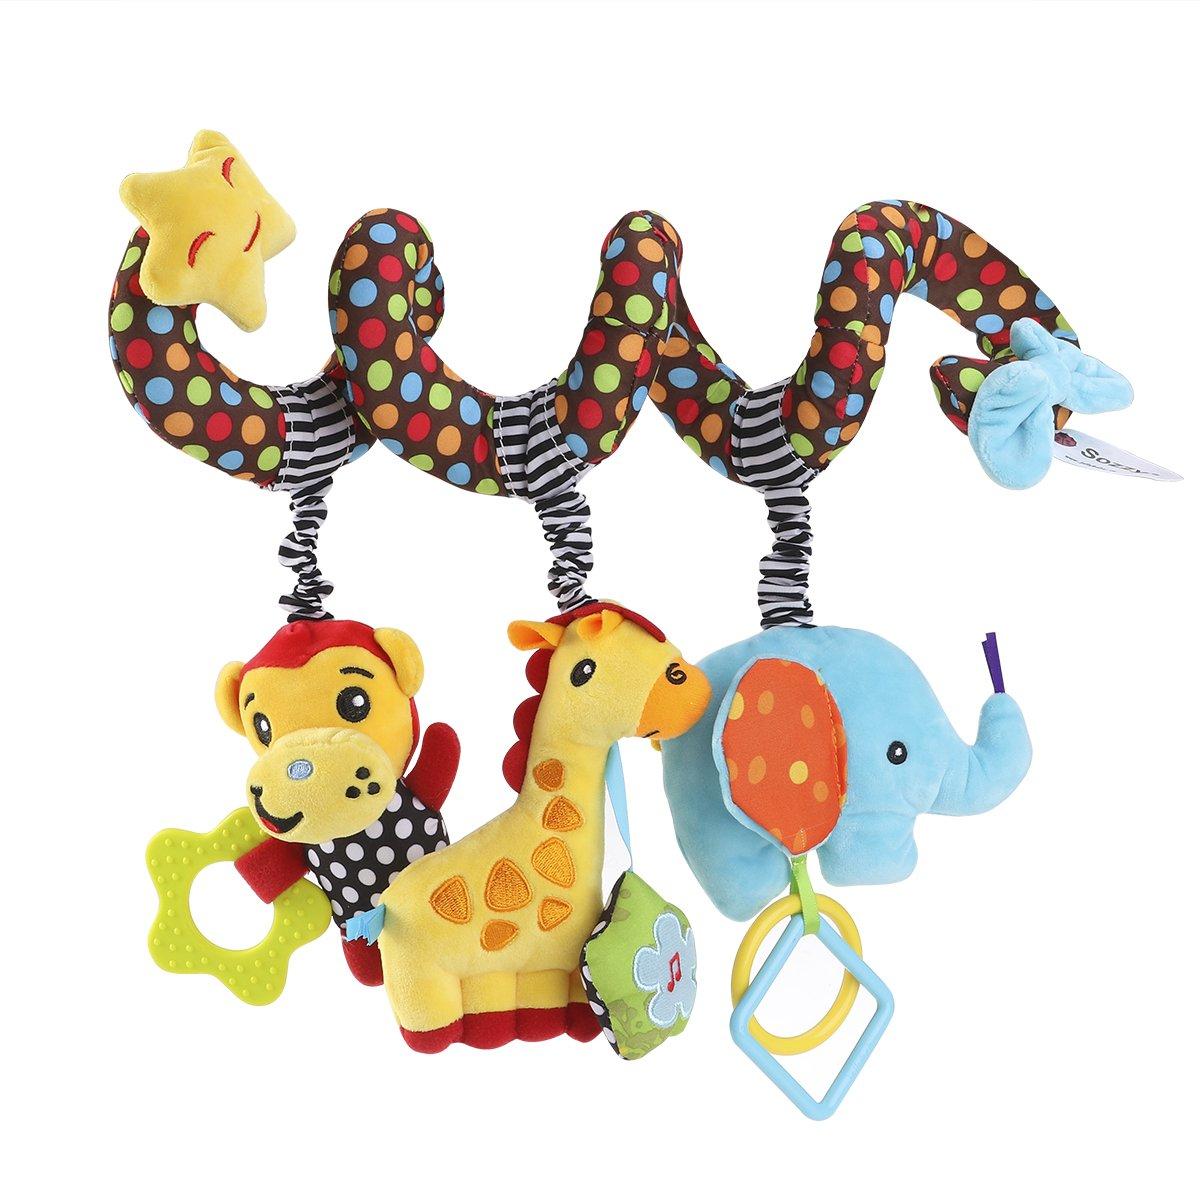 TOYMYTOY Kid Baby Spiral Bed Stroller Toy Monkey Elephant Educational Plush Toy